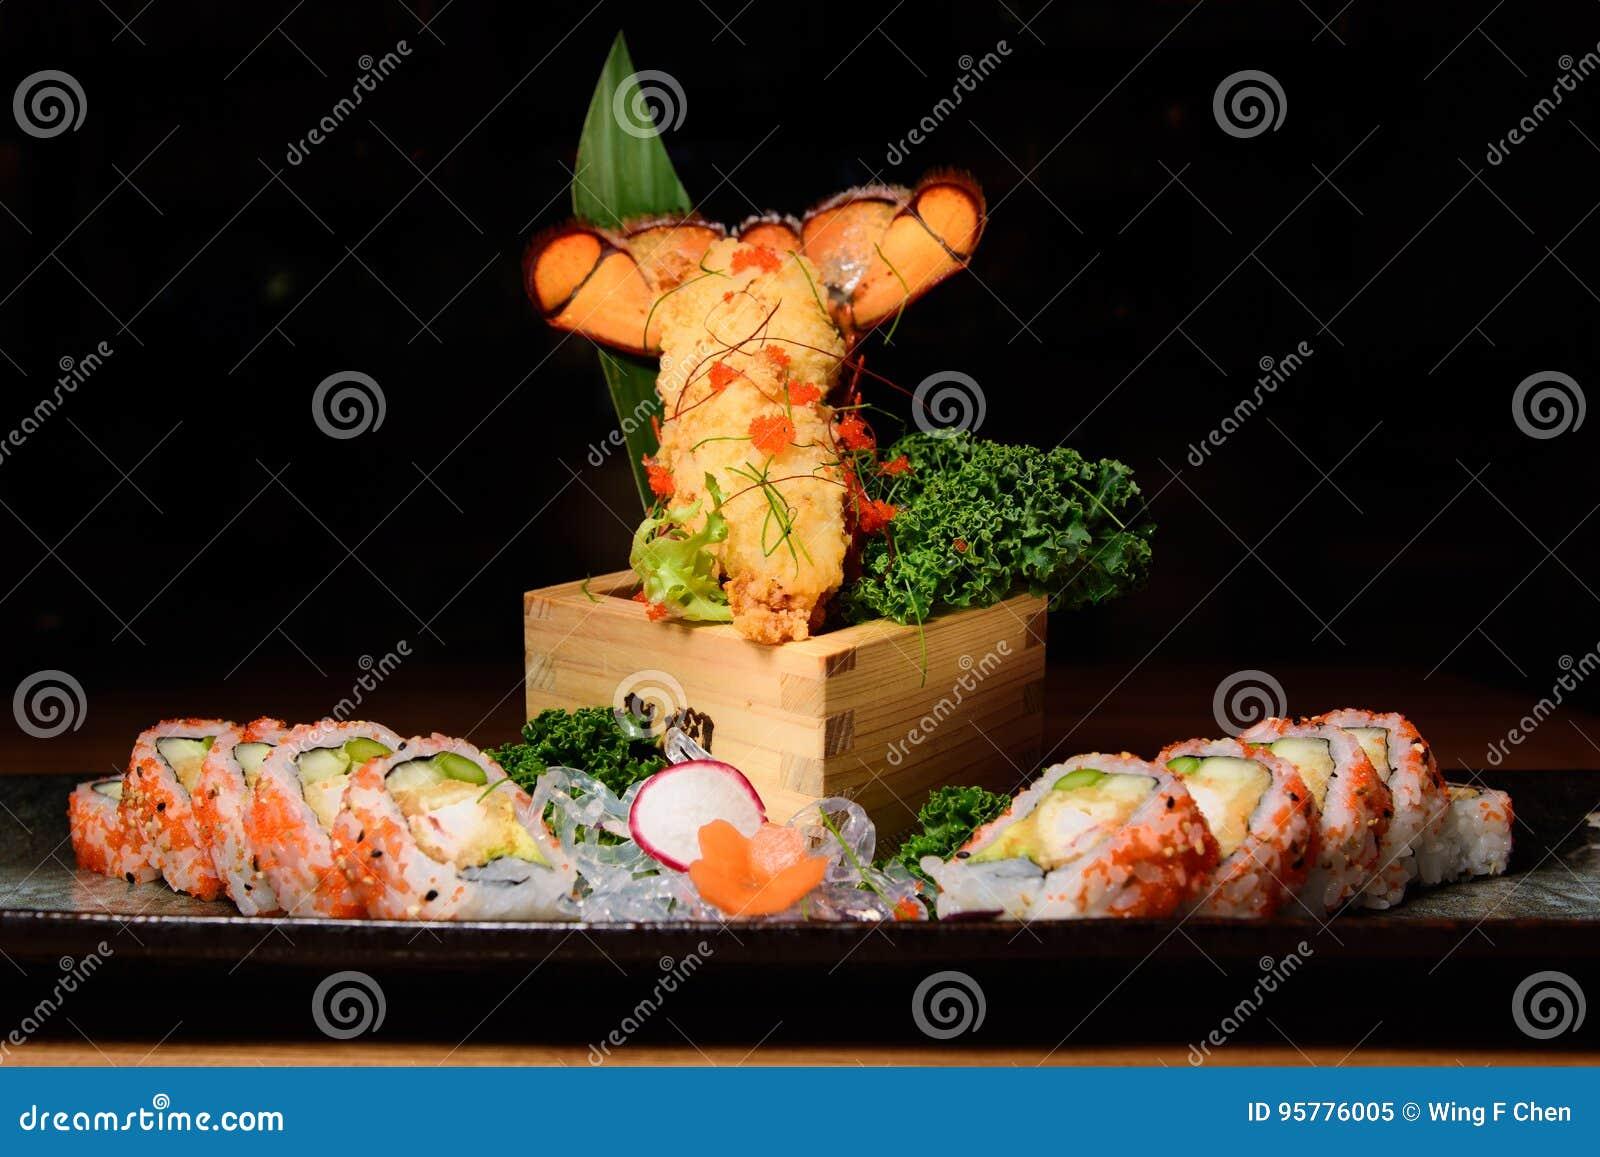 Lobster sushi roll